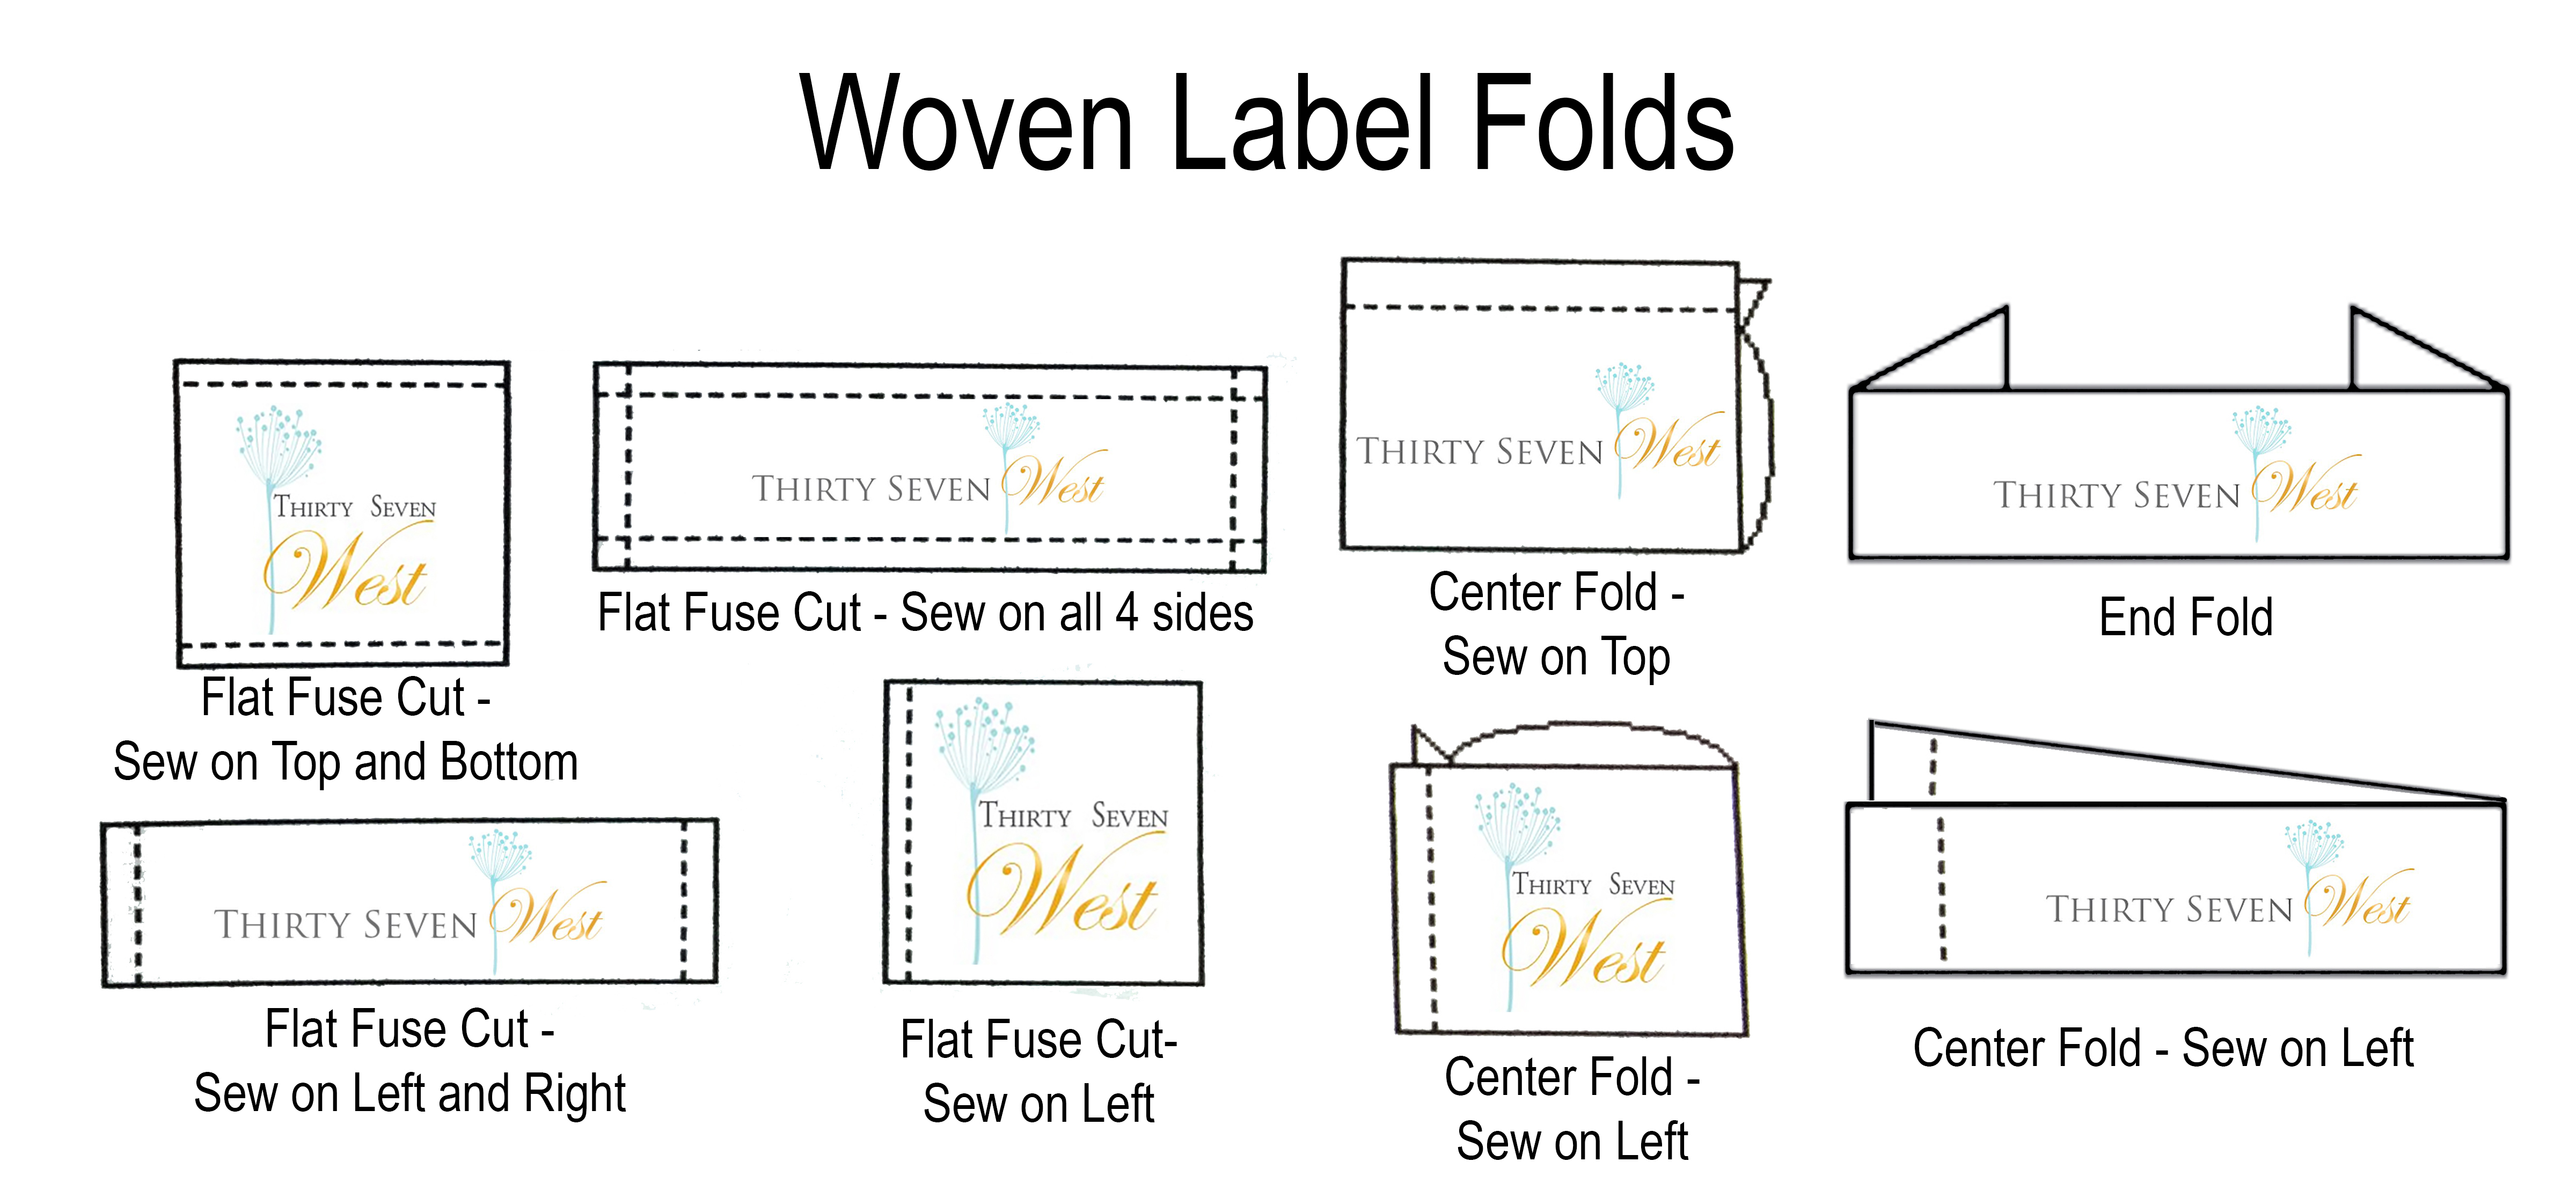 Custom Woven Label Folds, custom woven labels, personalized labels, custom labels, personalized woven labels, fabric labels, custom fabric labels, personalized fabric labels, Flat labels, End fold labels,